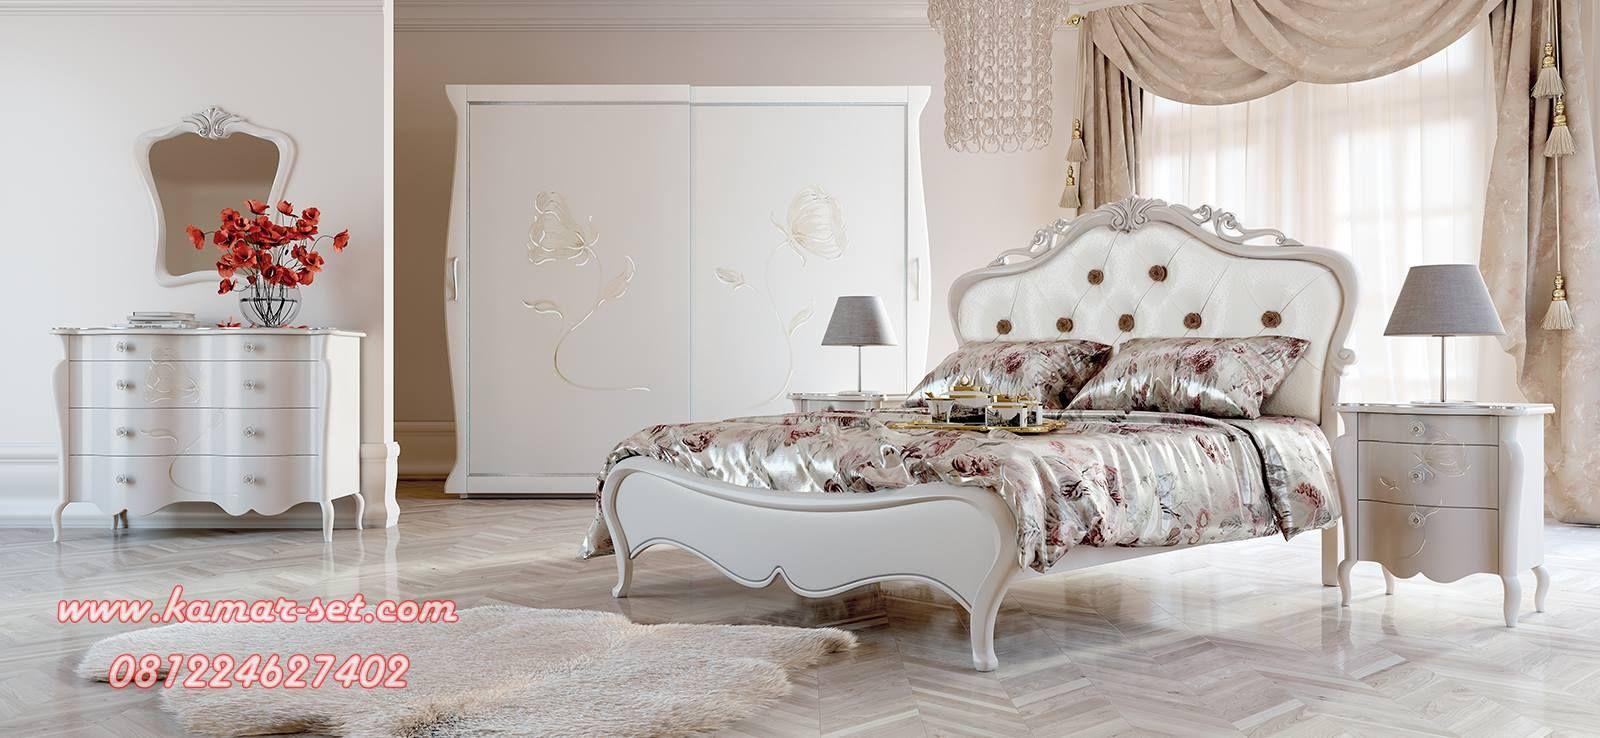 Harga Set Kamar Tidur Romantis Klasik Mewah Ksk 55 Set Kamar Tidur Romantis Klasik Mewah Ksk 55 Ini Adalah Sebua Set Kamar Tidur Kamar Tidur Romantis Furniture